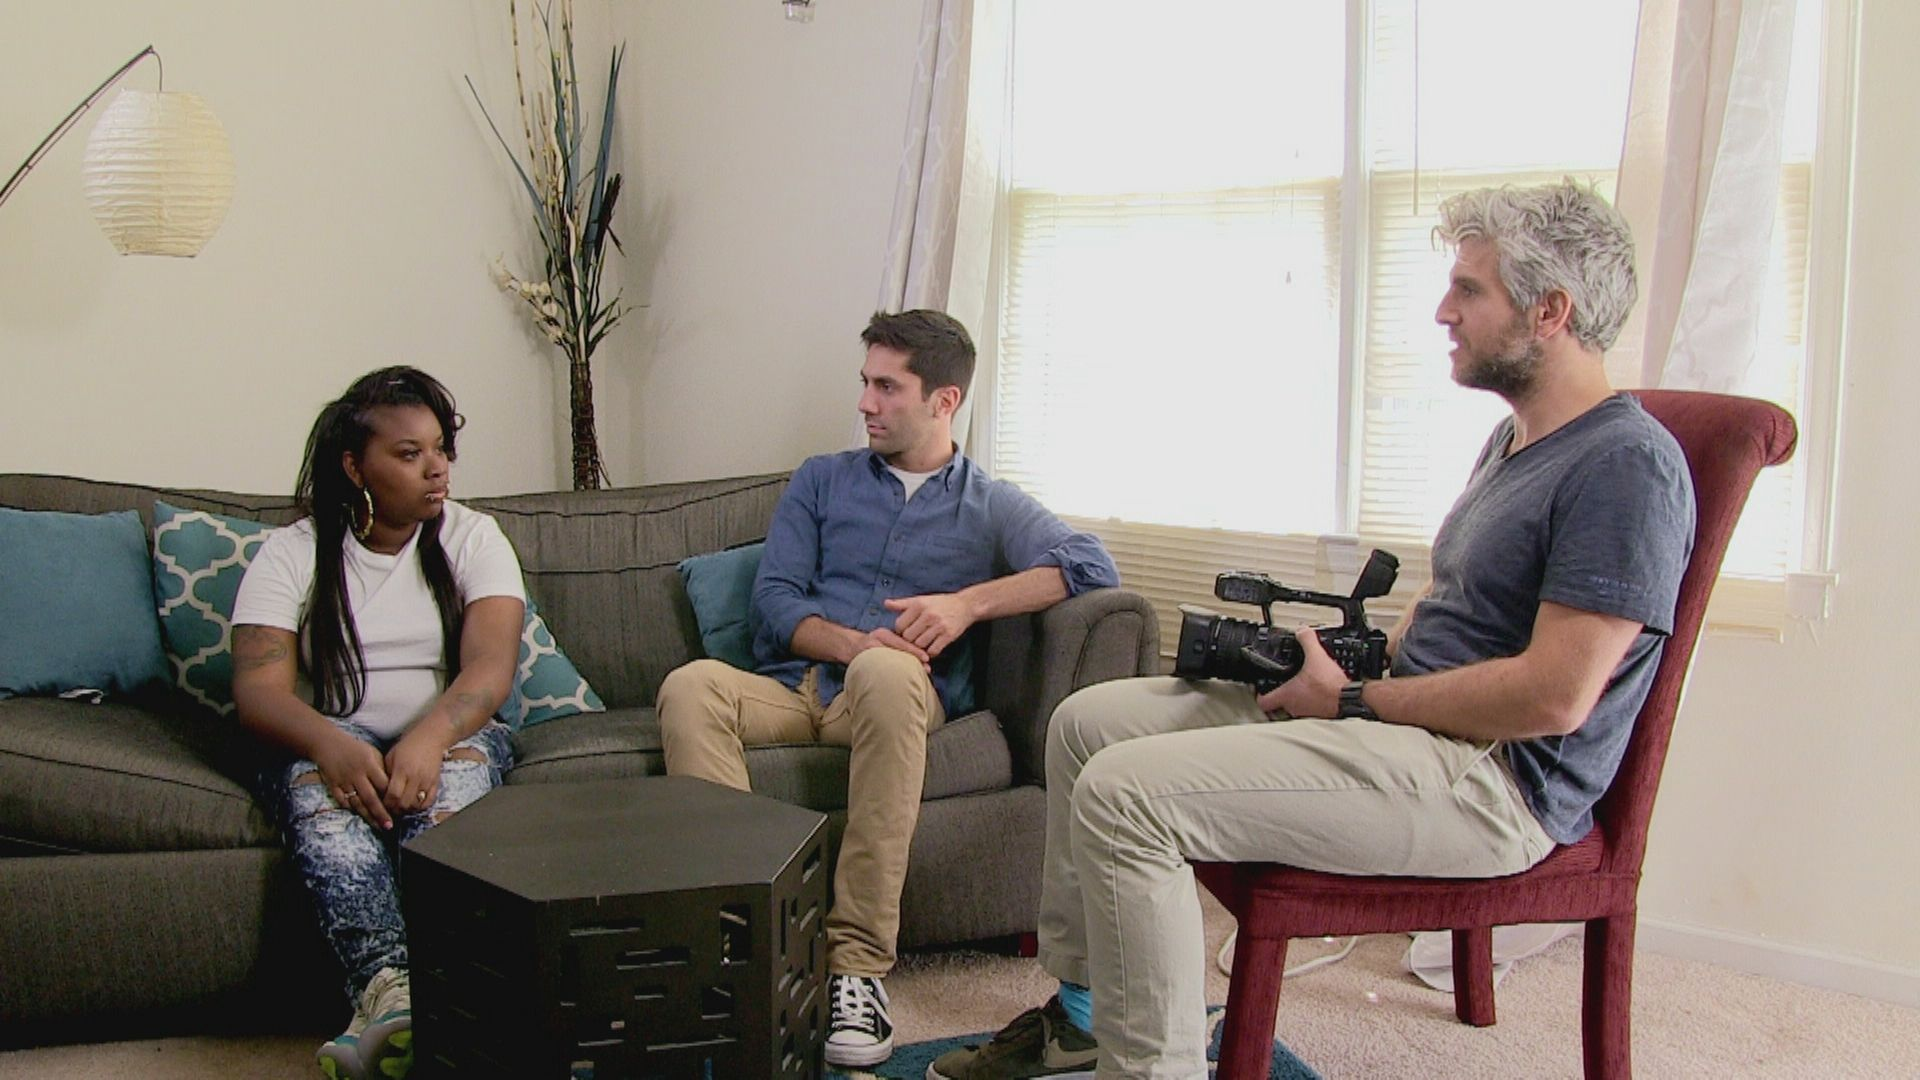 Catfish: The TV Show News & Full Episode | S4, E11 - Tiana ...